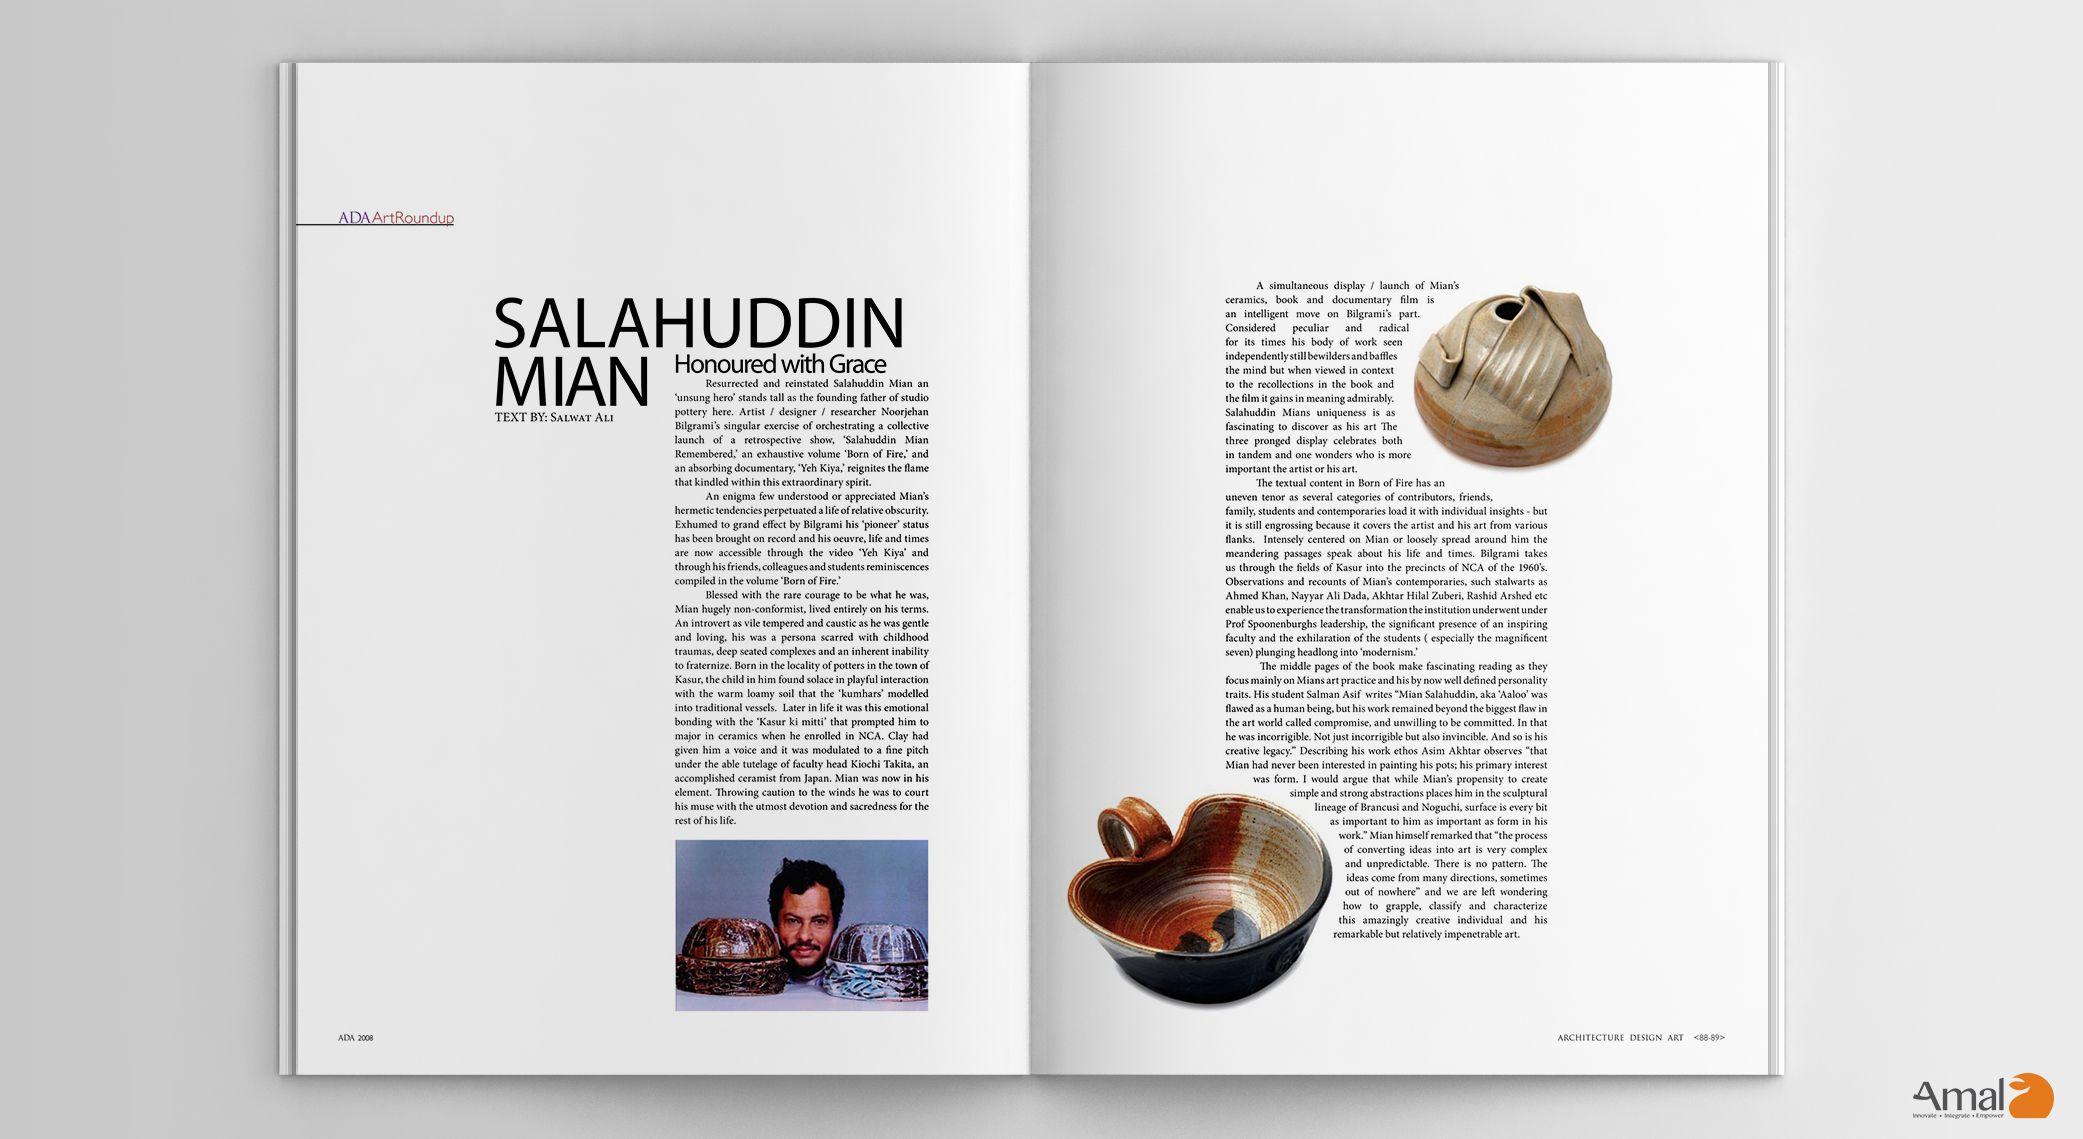 Salahuddin Mian. ADA (Architecture Design Art)